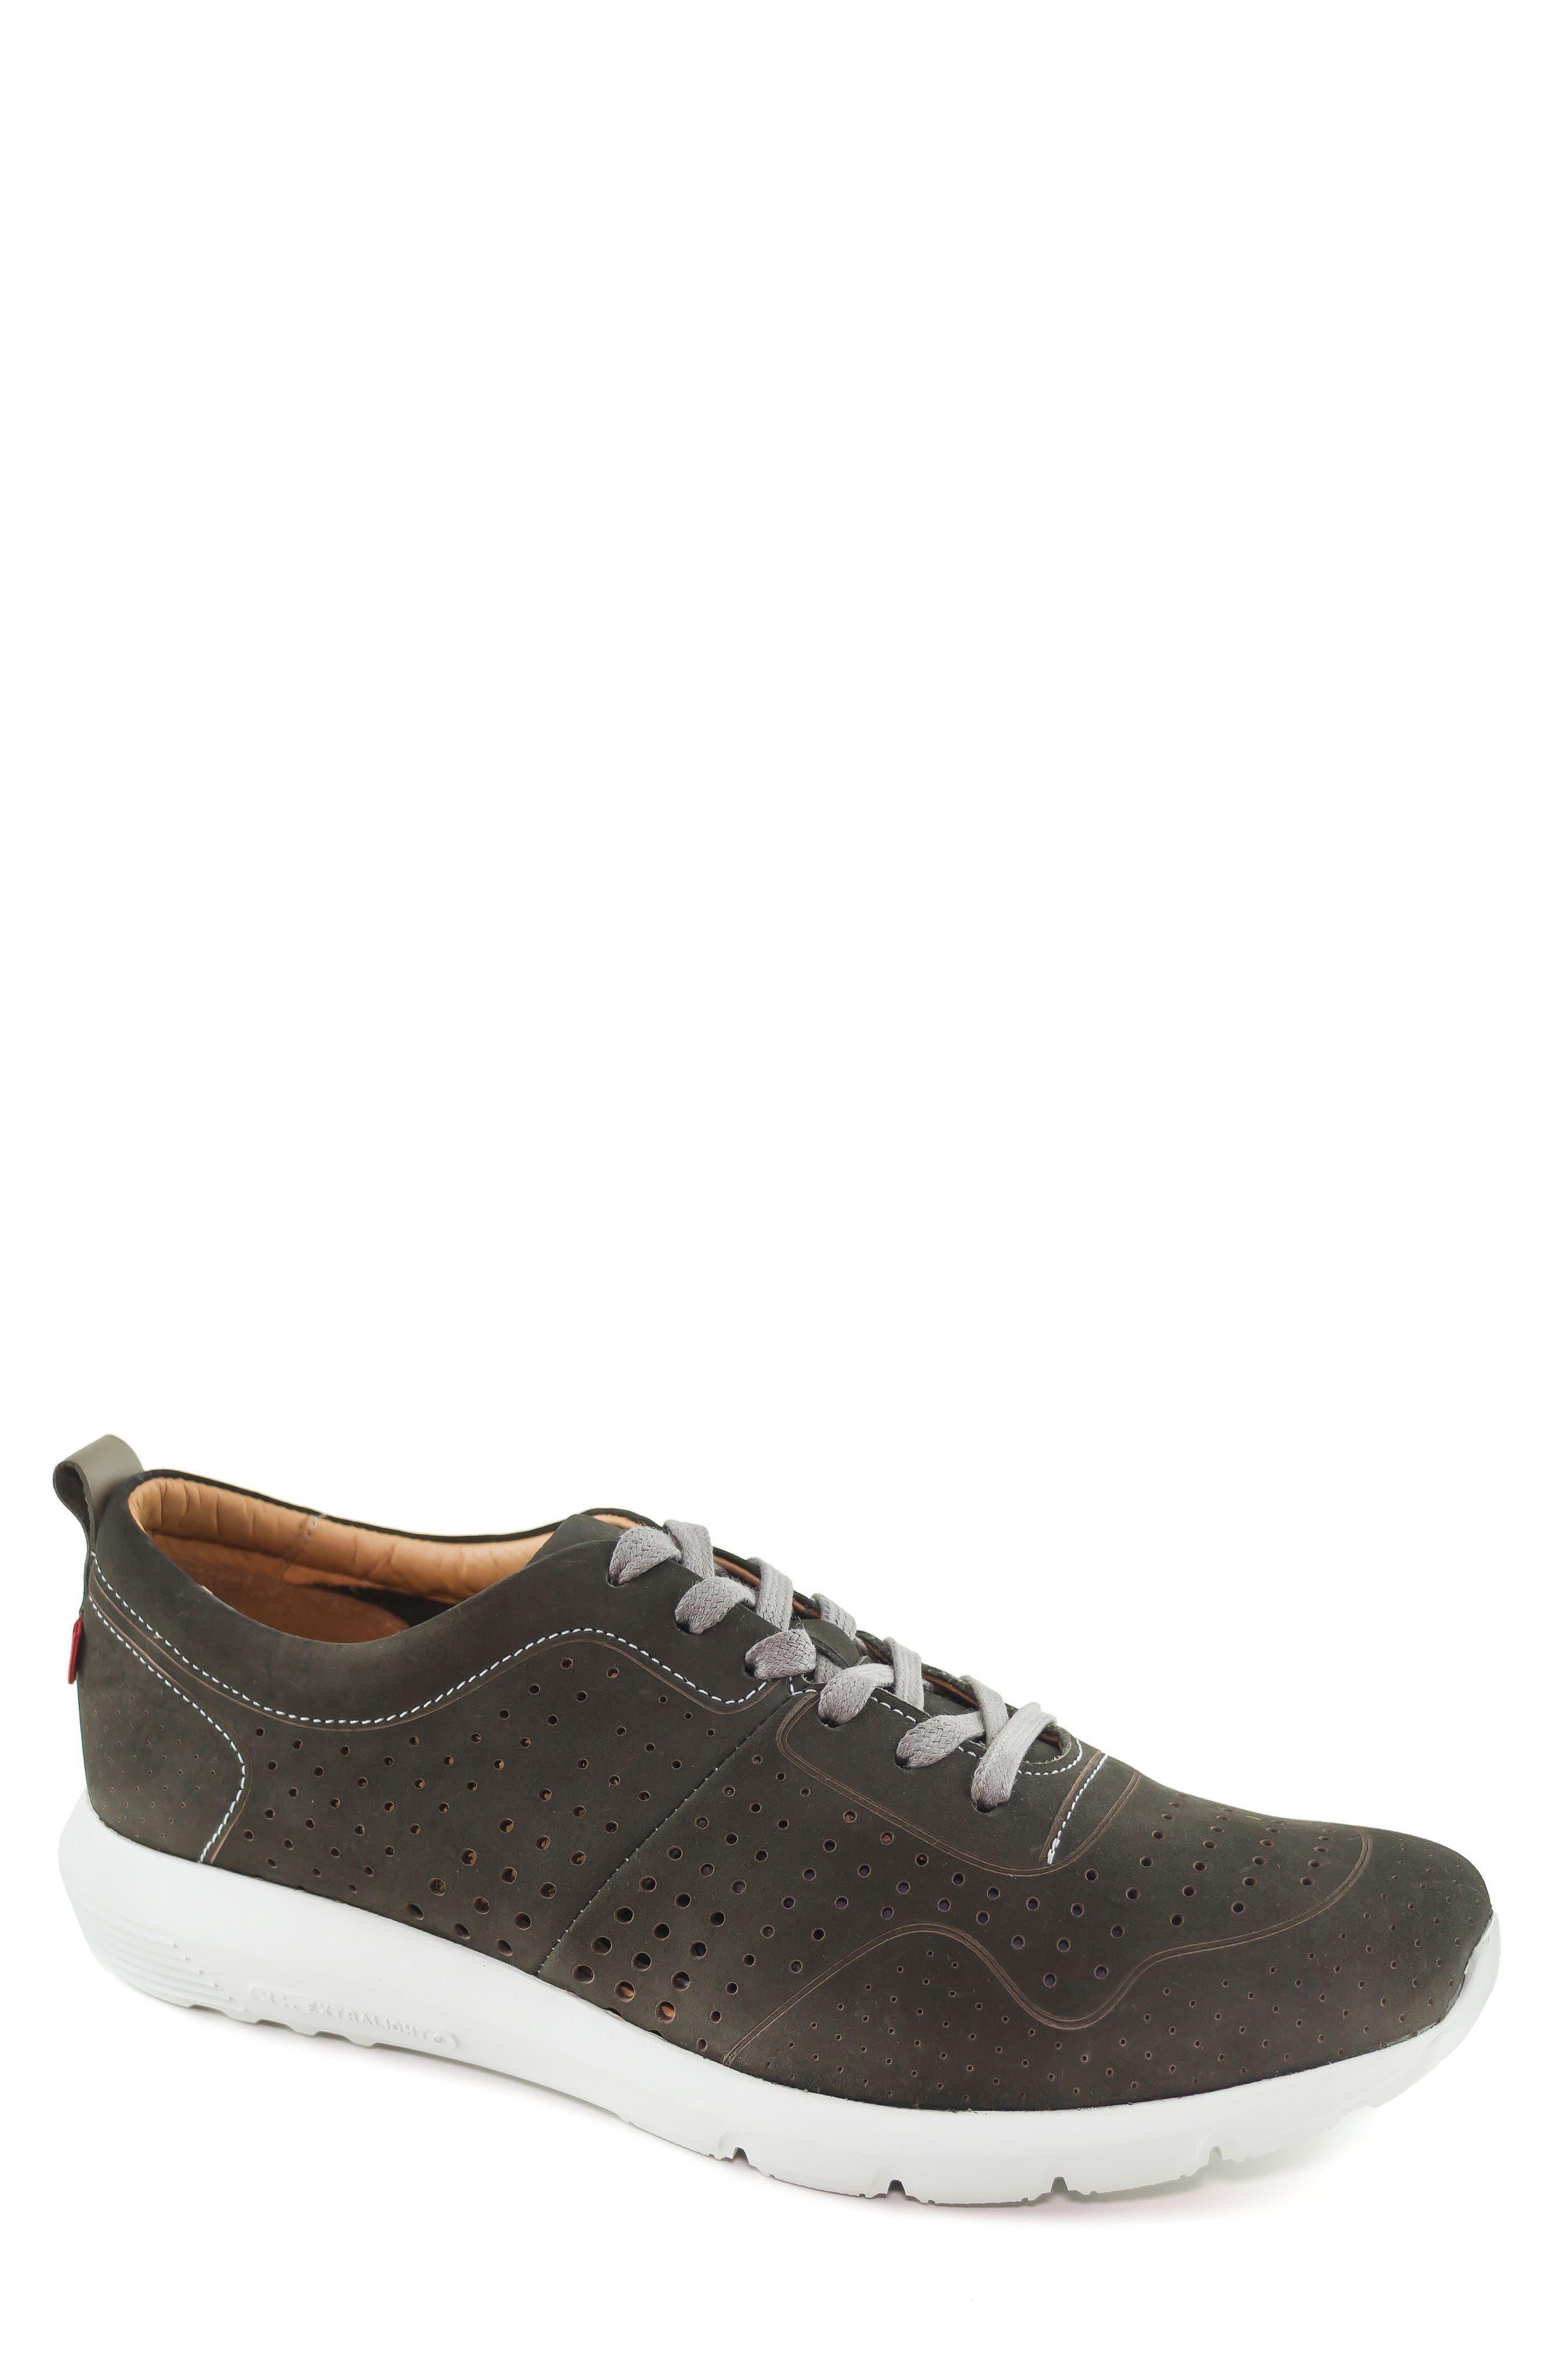 Marc Joseph New York Grand Central Perforated Sneaker (Men)